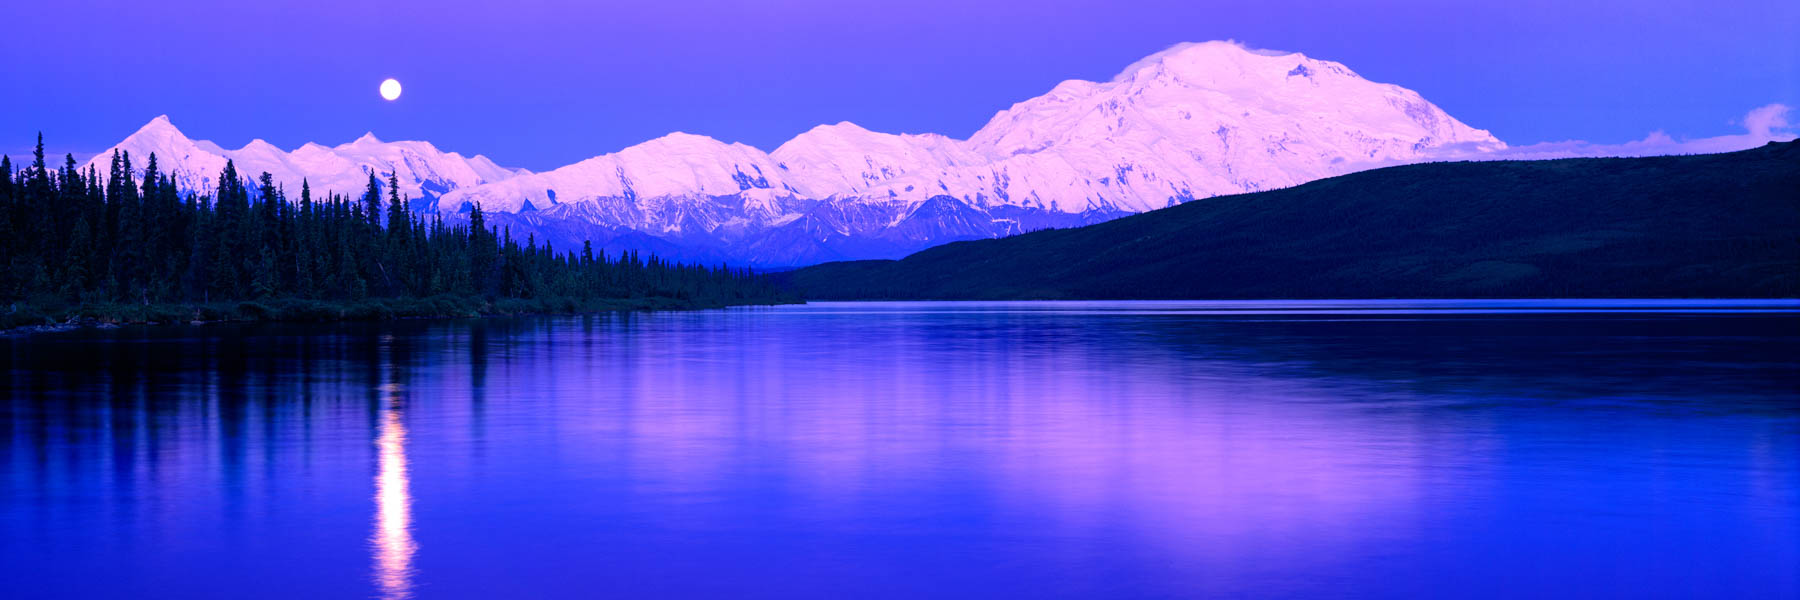 Full moon over Wonder Lake, Denali National Park, Alaska, USA